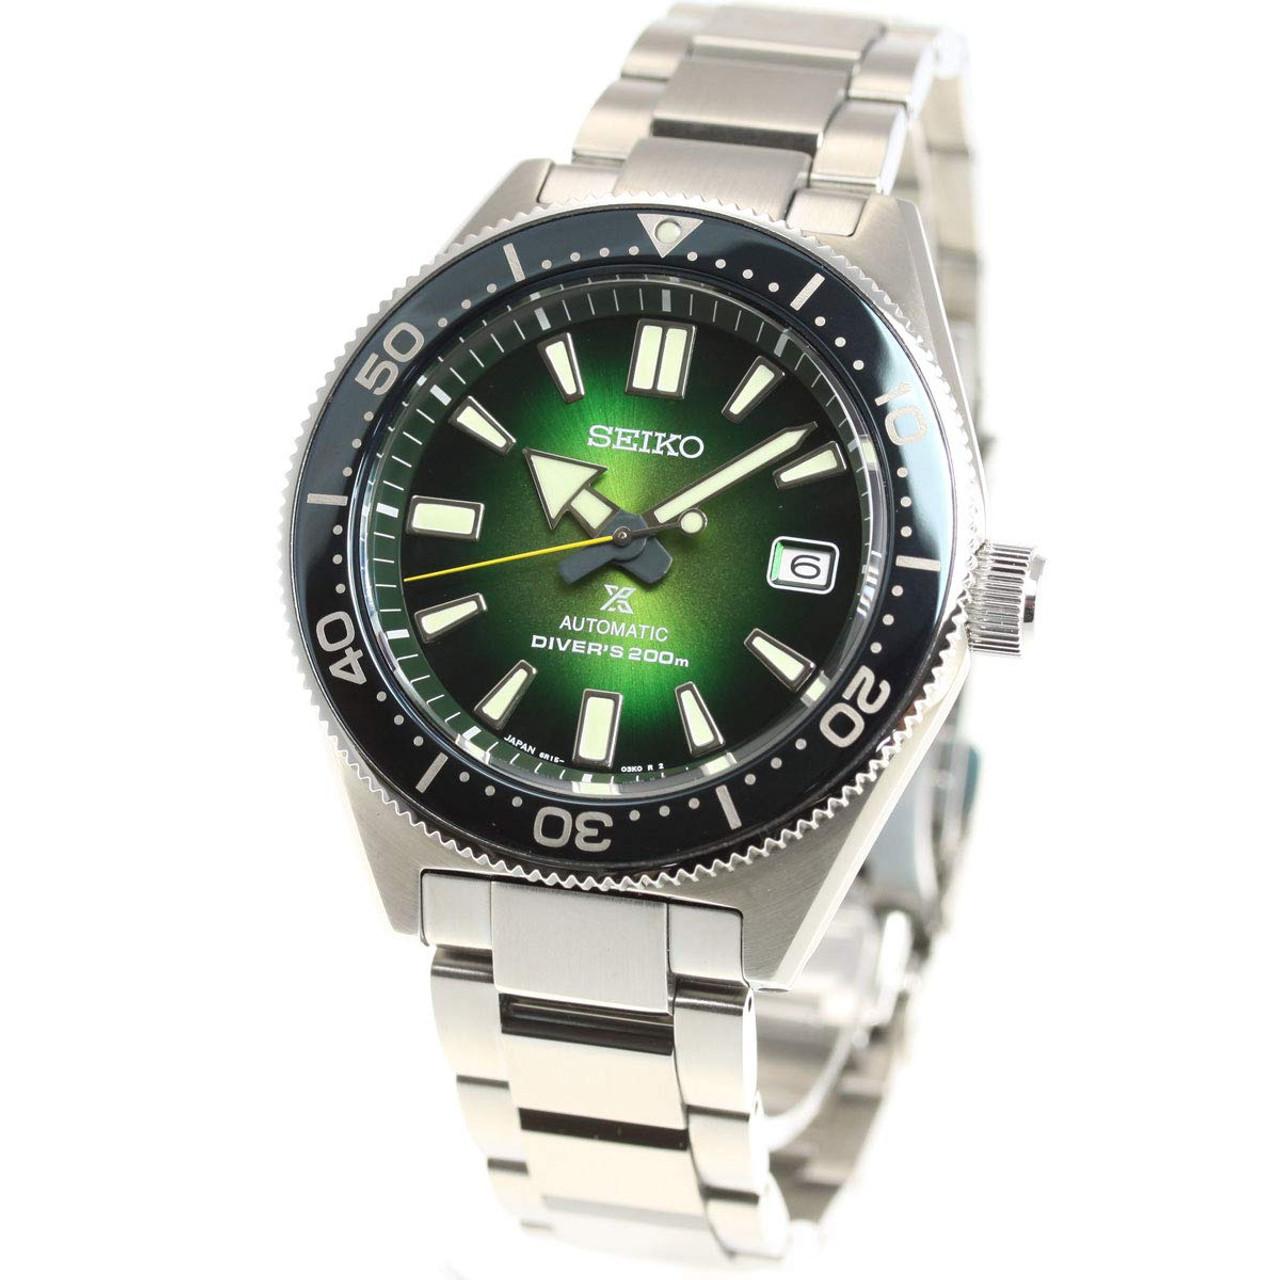 Seiko Prospex Green SBDC077 Special Edition 62MAS